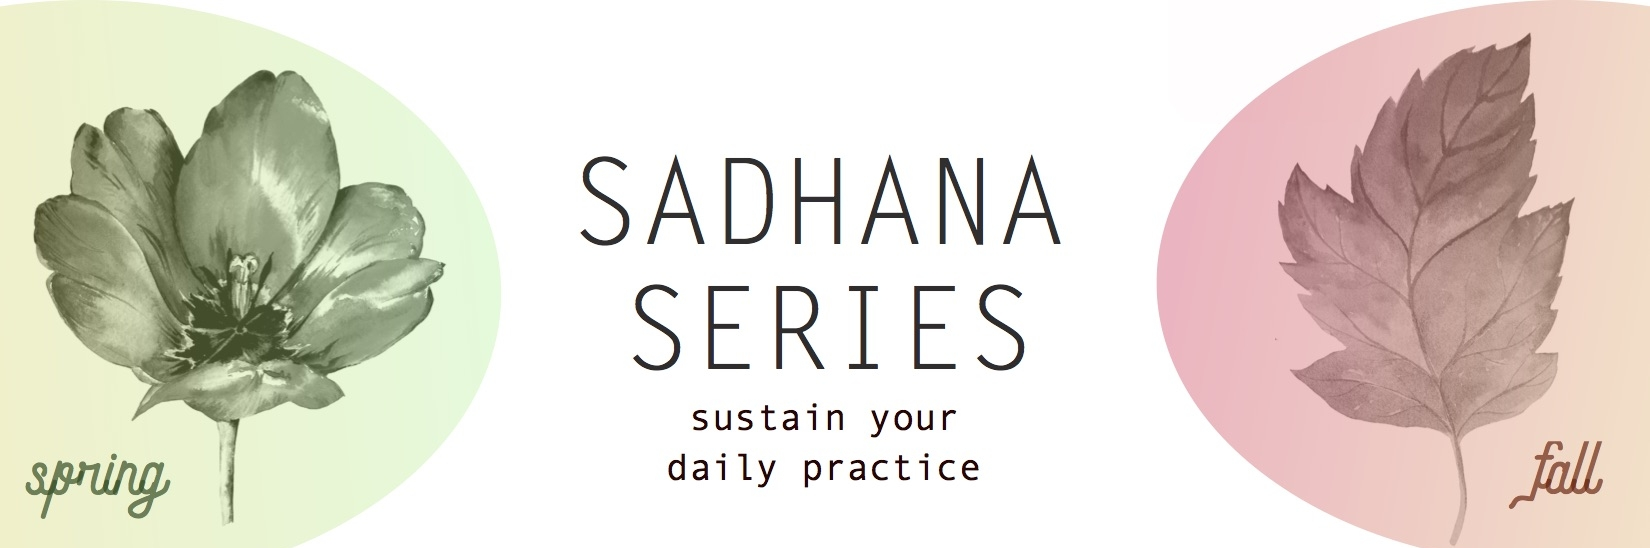 SadhanaBanner.jpg